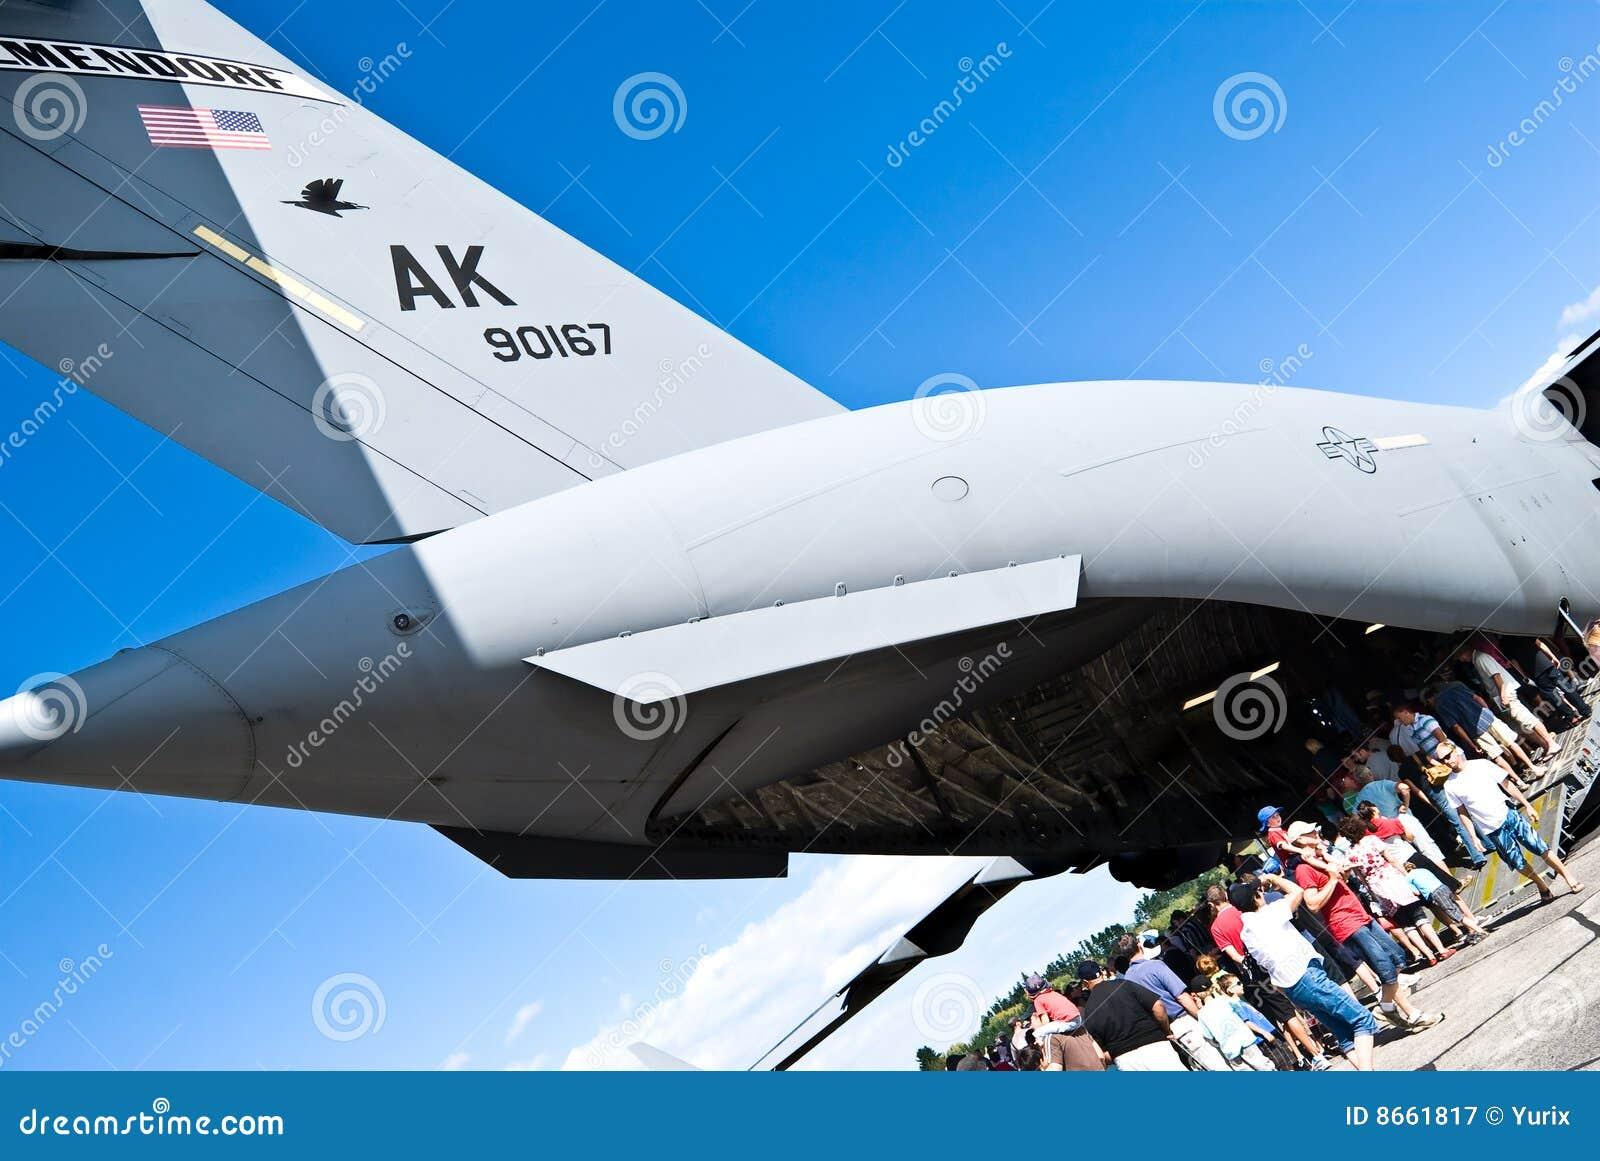 Fête aérienne. C-17 de Boeing Globemaster